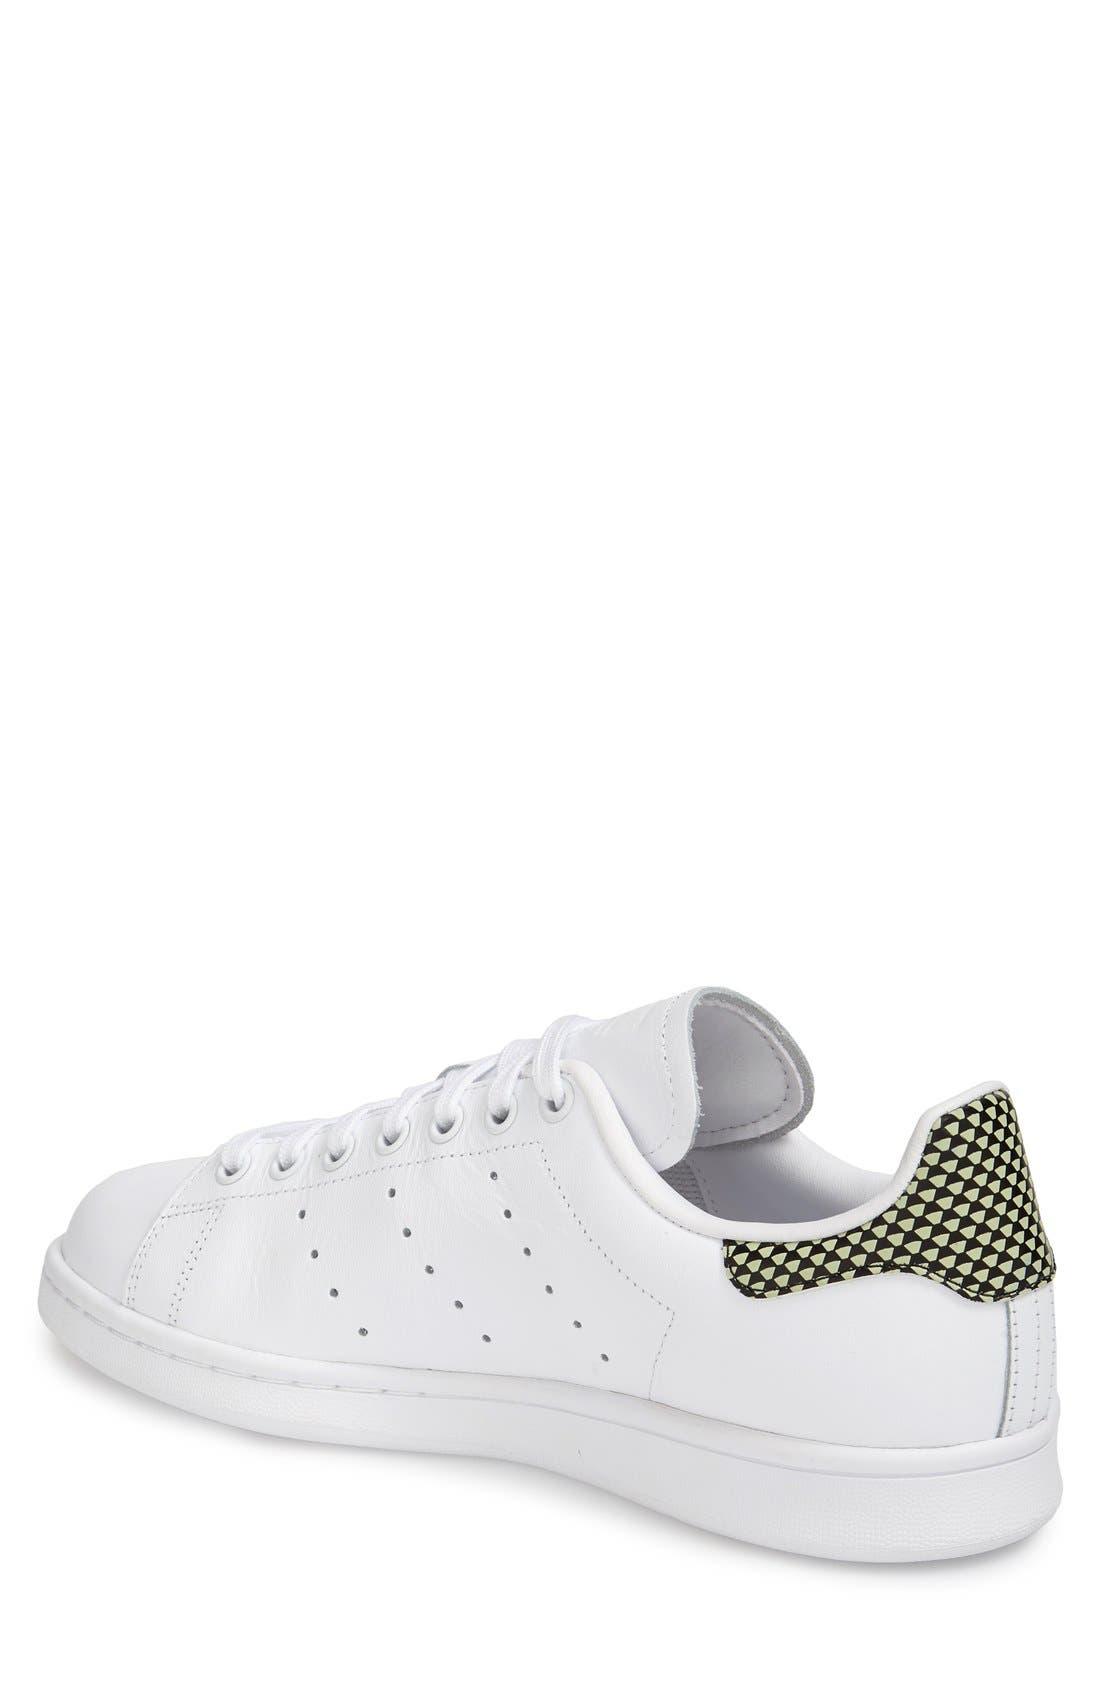 'Stan Smith' Sneaker,                             Alternate thumbnail 85, color,